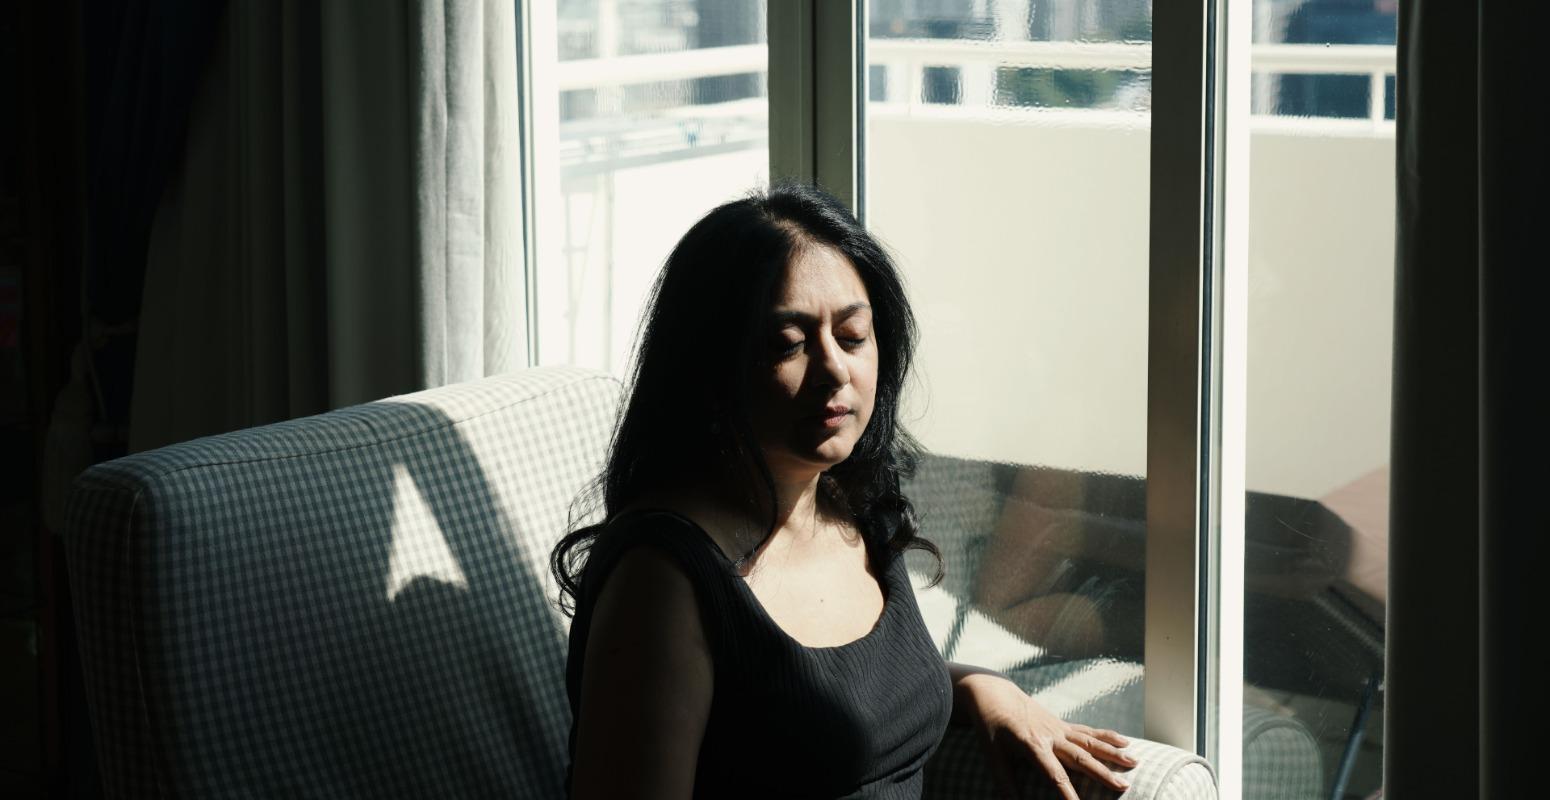 Meet Jasmine, The Singaporean Woman Who Was Friends With Pablo Escobar's Drug Dealer